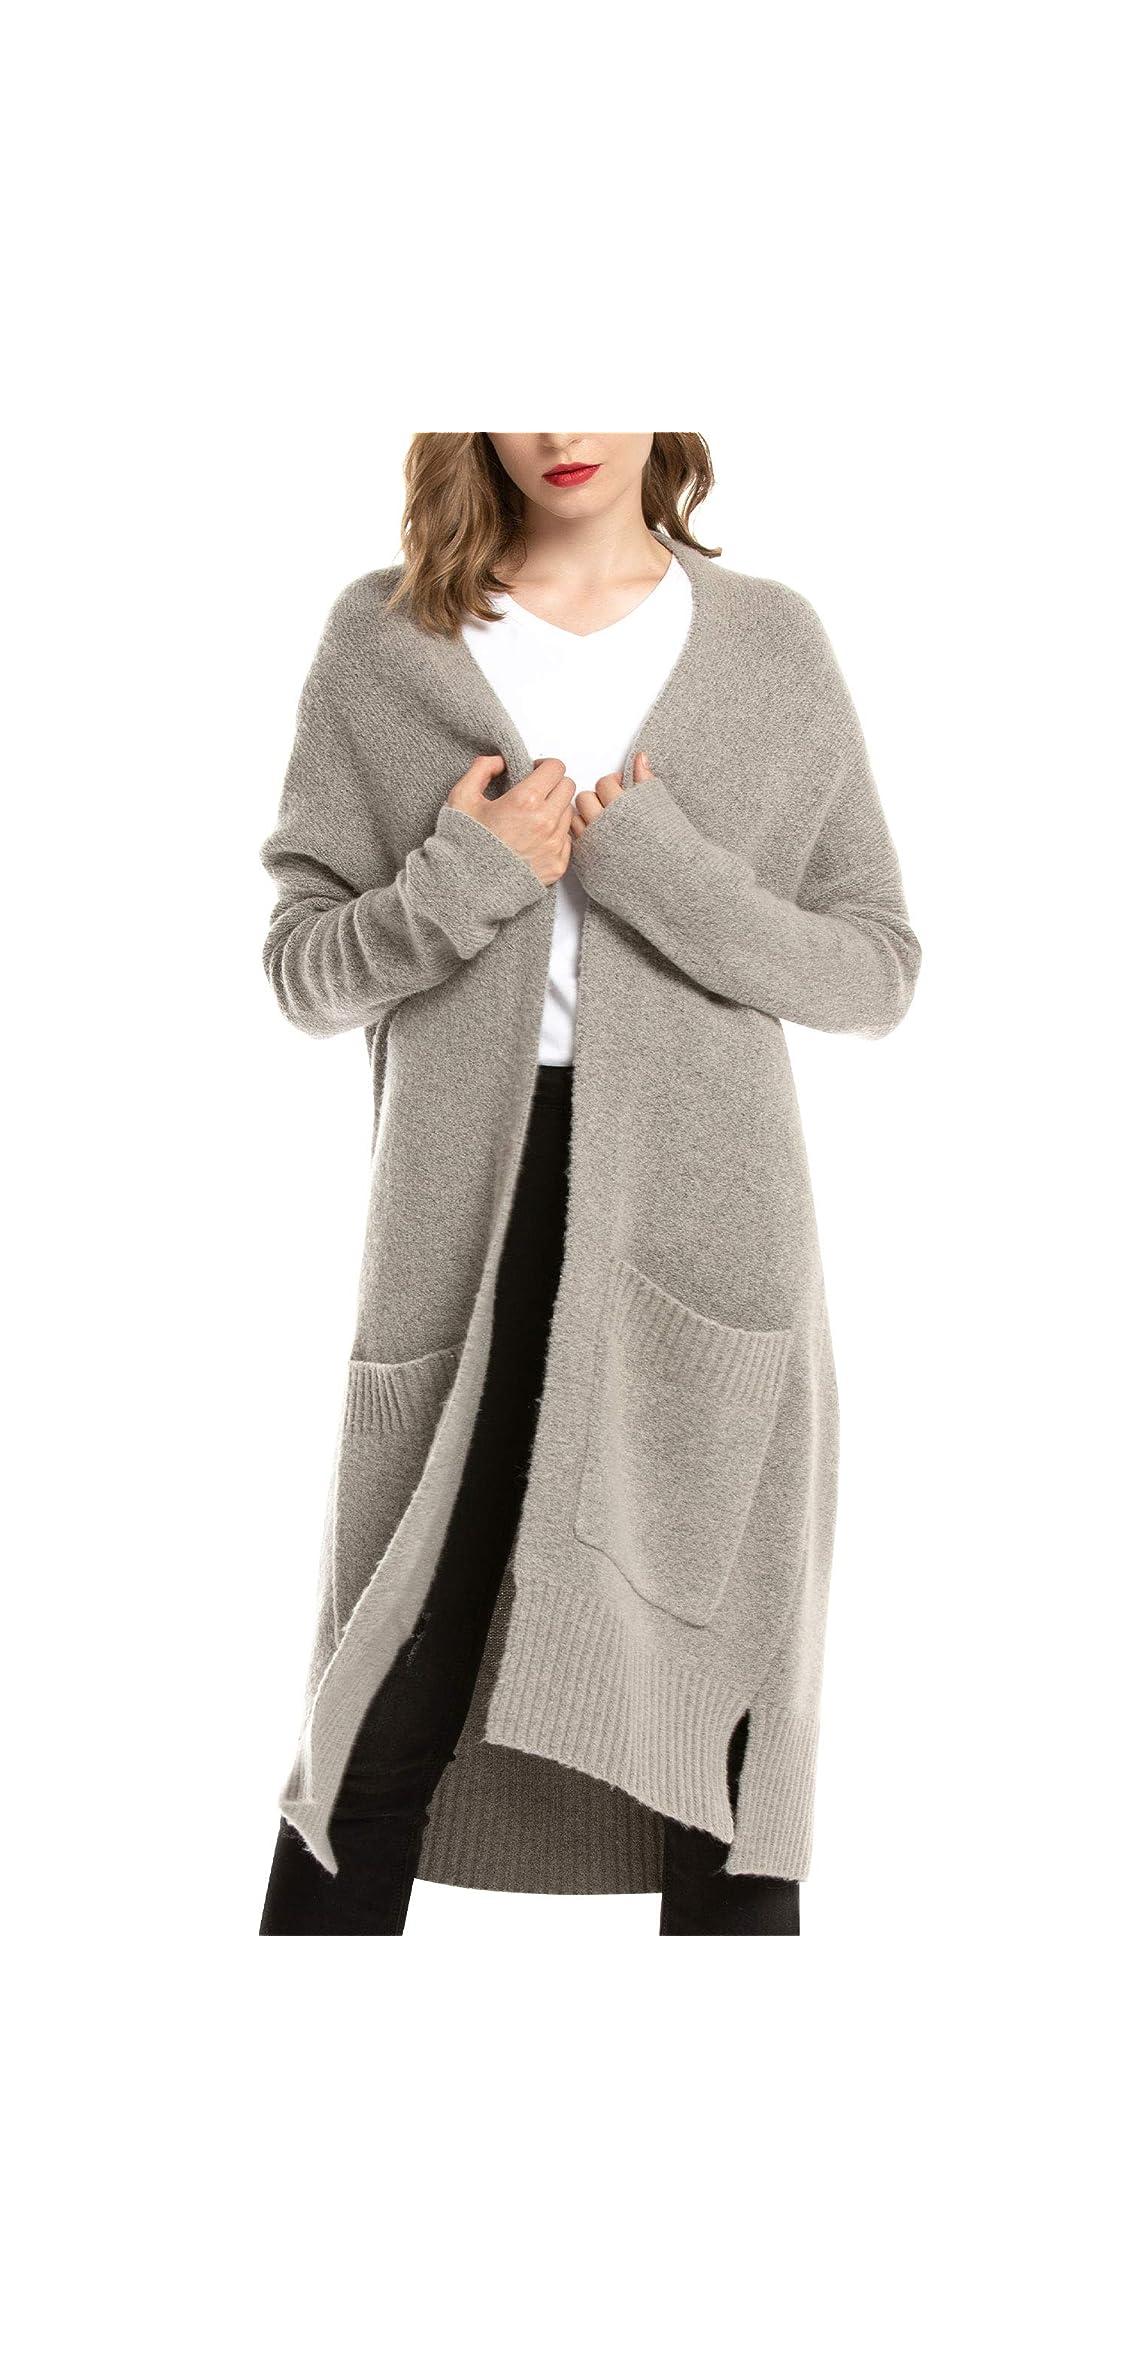 Womens Long Cardigan Sweater Chunky Knit Cardigan